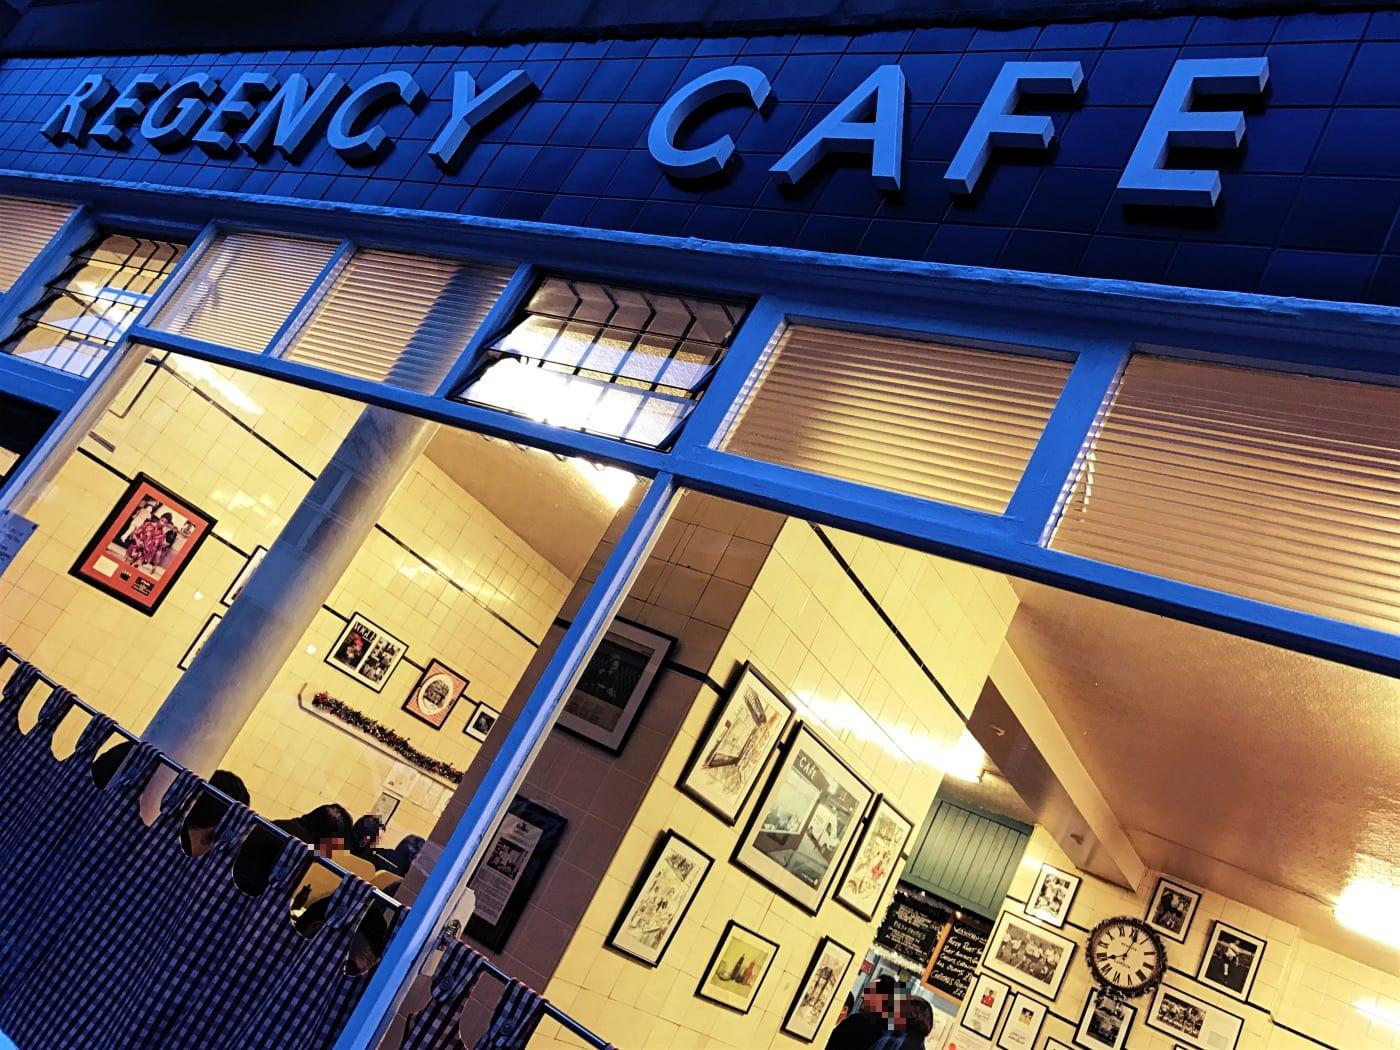 regency-cafe-london-2